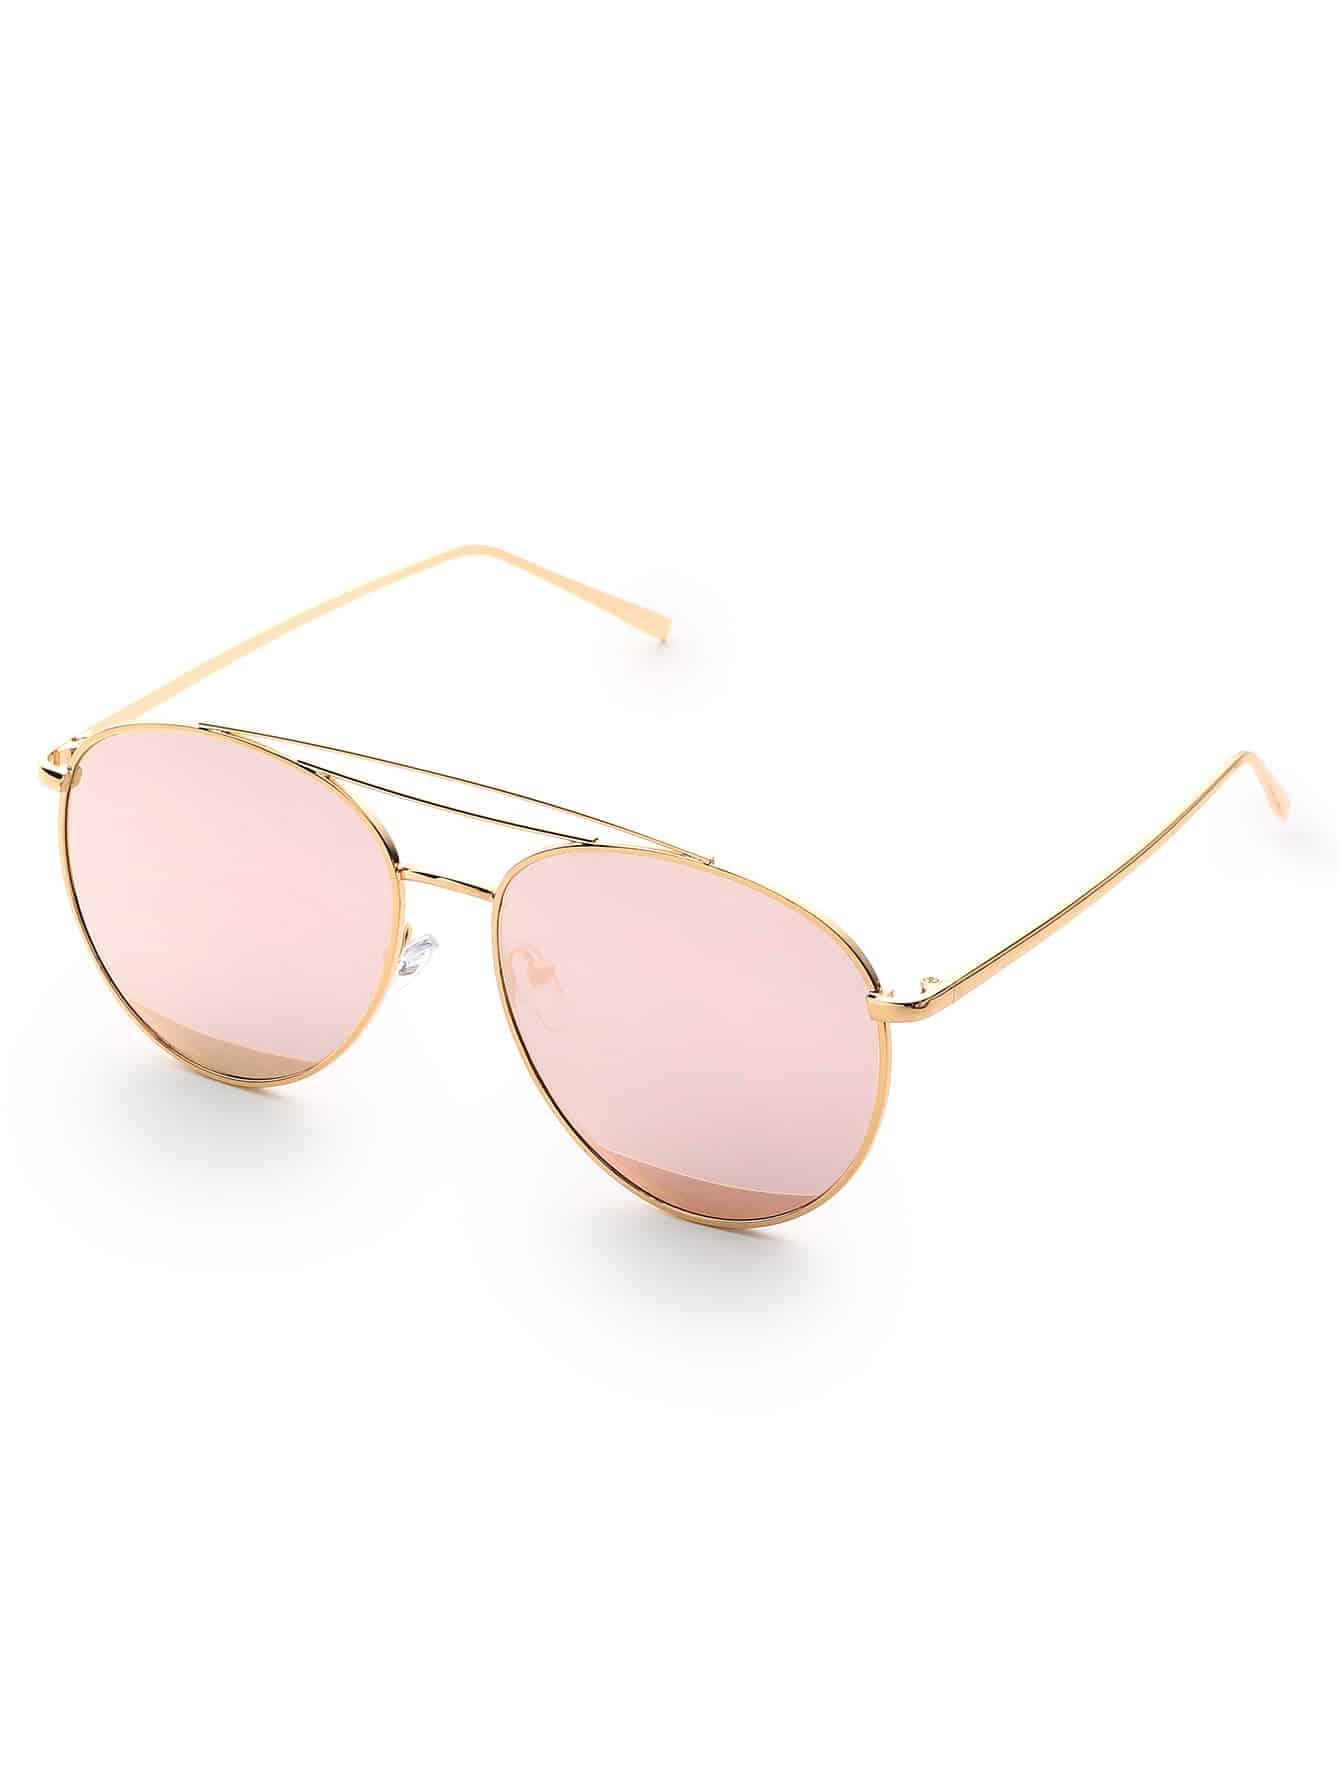 Triple Bridge Aviator Sunglasses